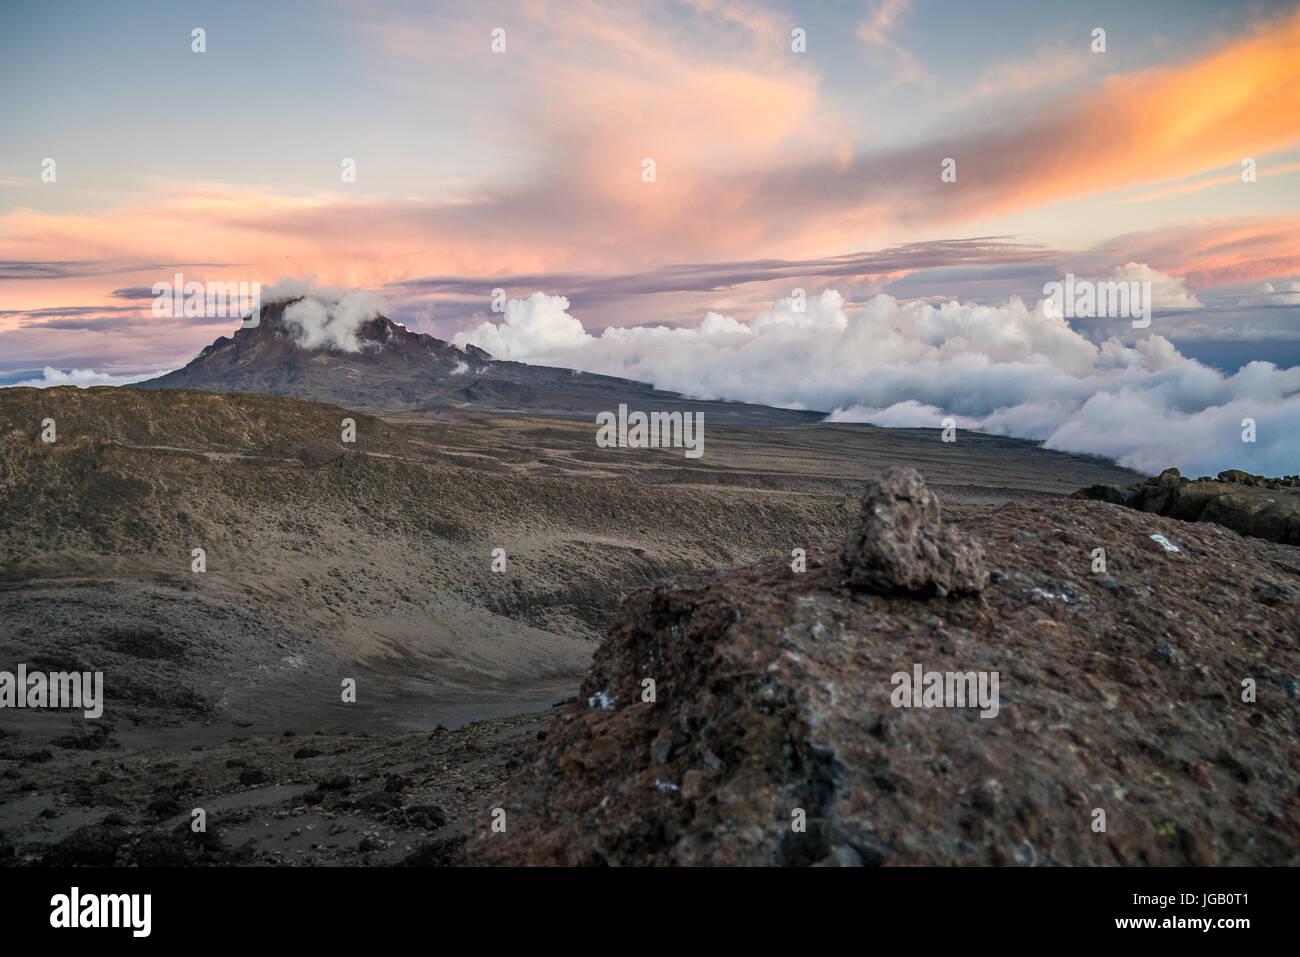 Mawenzi Peak - second highest volcanic cones of Mount Kilimanjaro, Tanzania, Africa - Stock Image